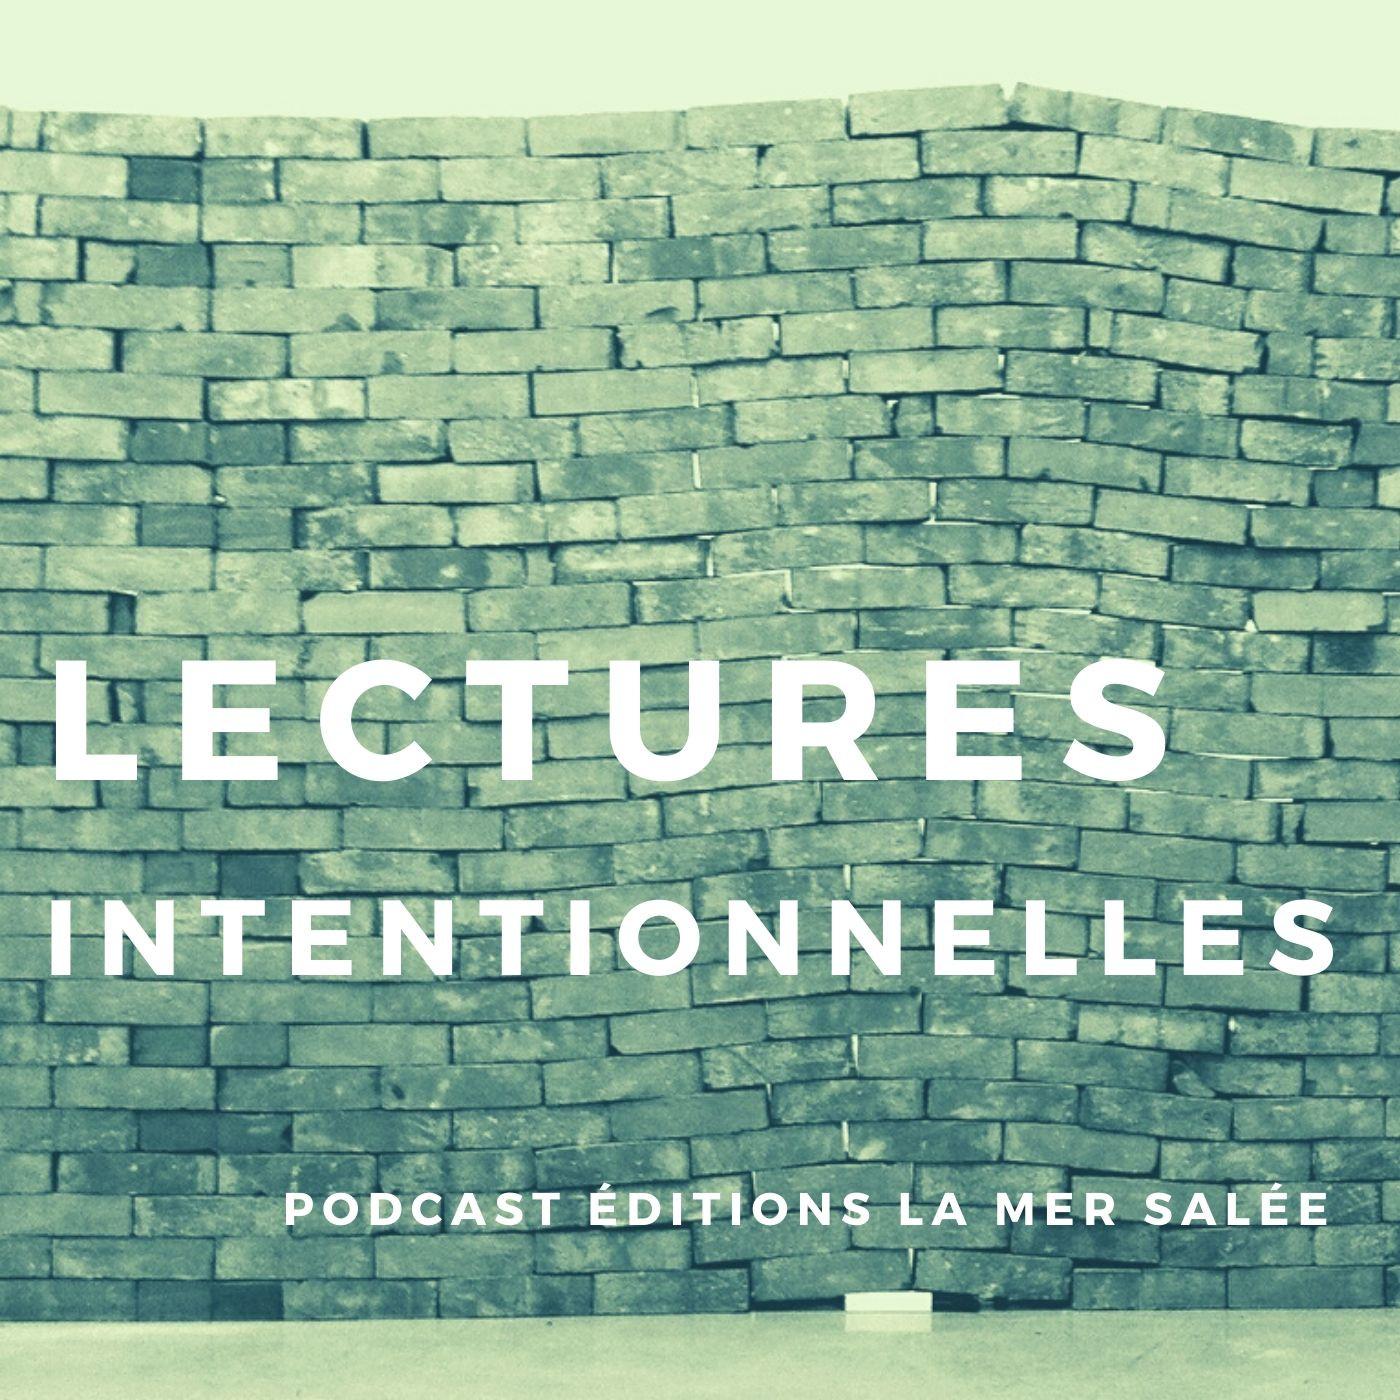 Lectures intentionnelles